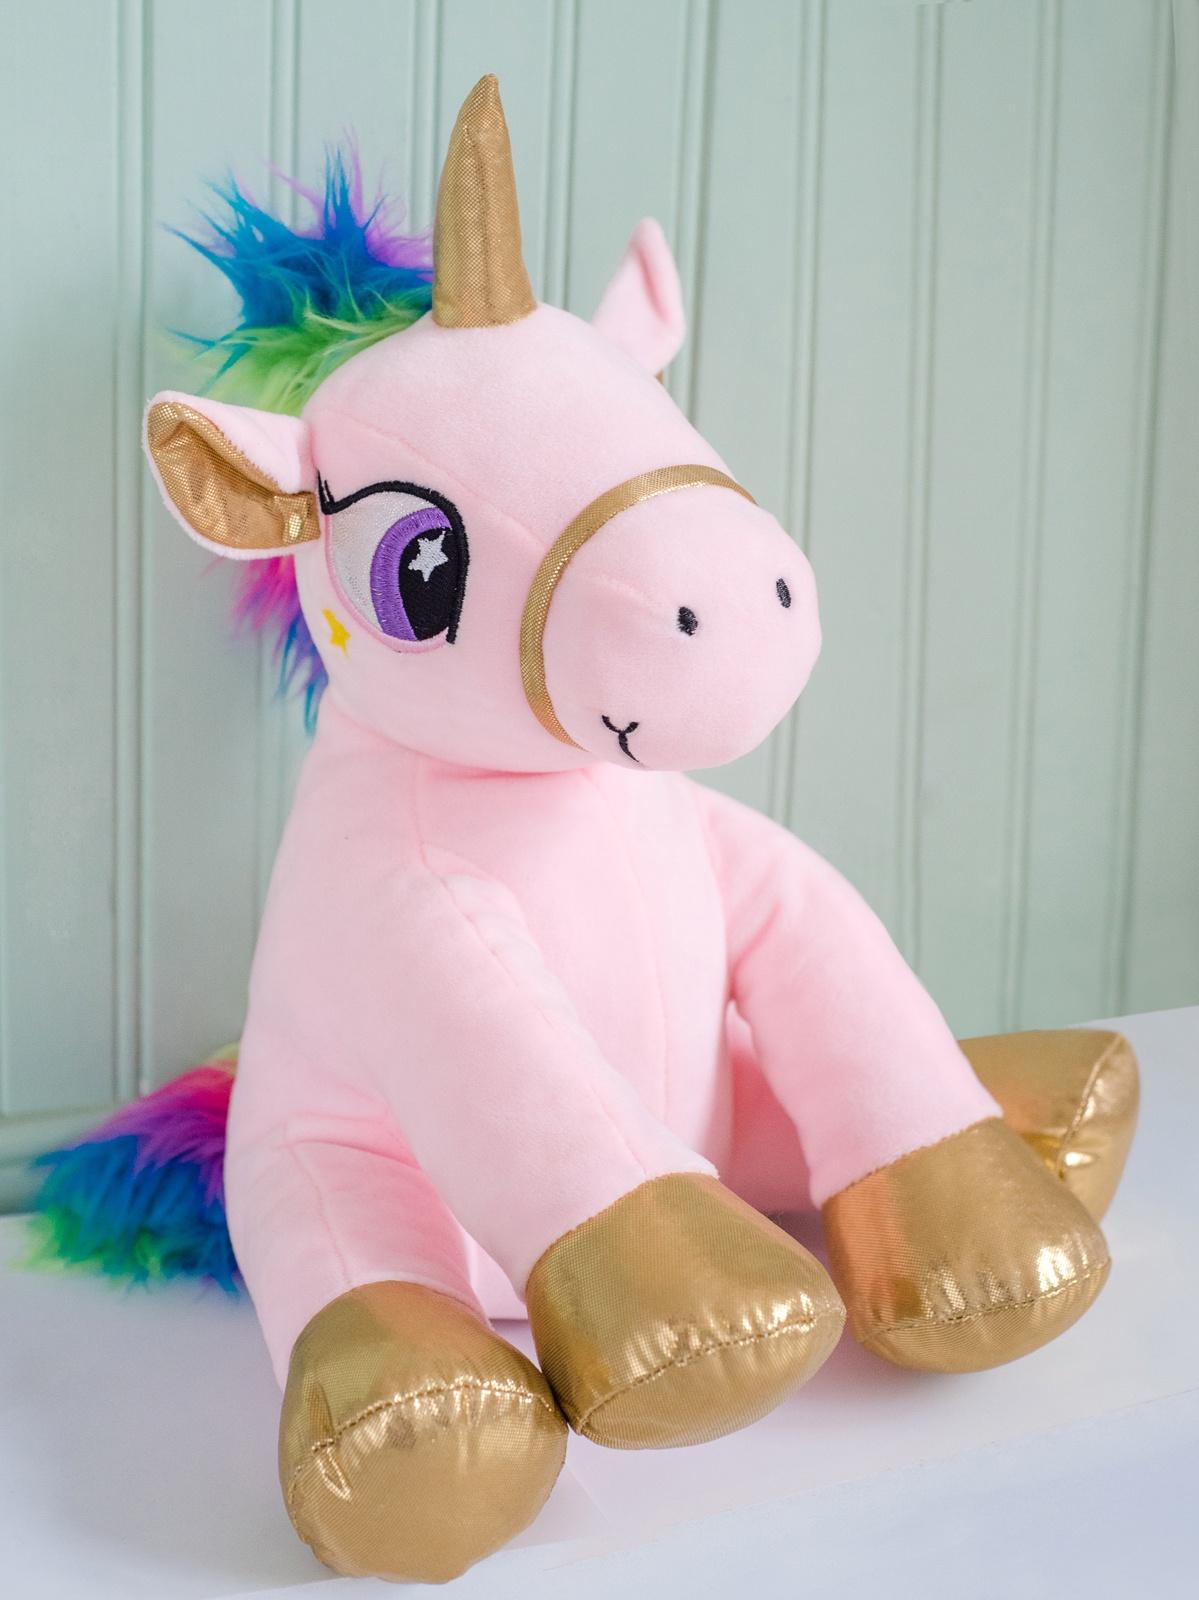 Мягкая игрушка Плюш Ленд Единорог, TL18083 светло-розовый кухонный набор сима ленд шеф повар хрюша 3505364